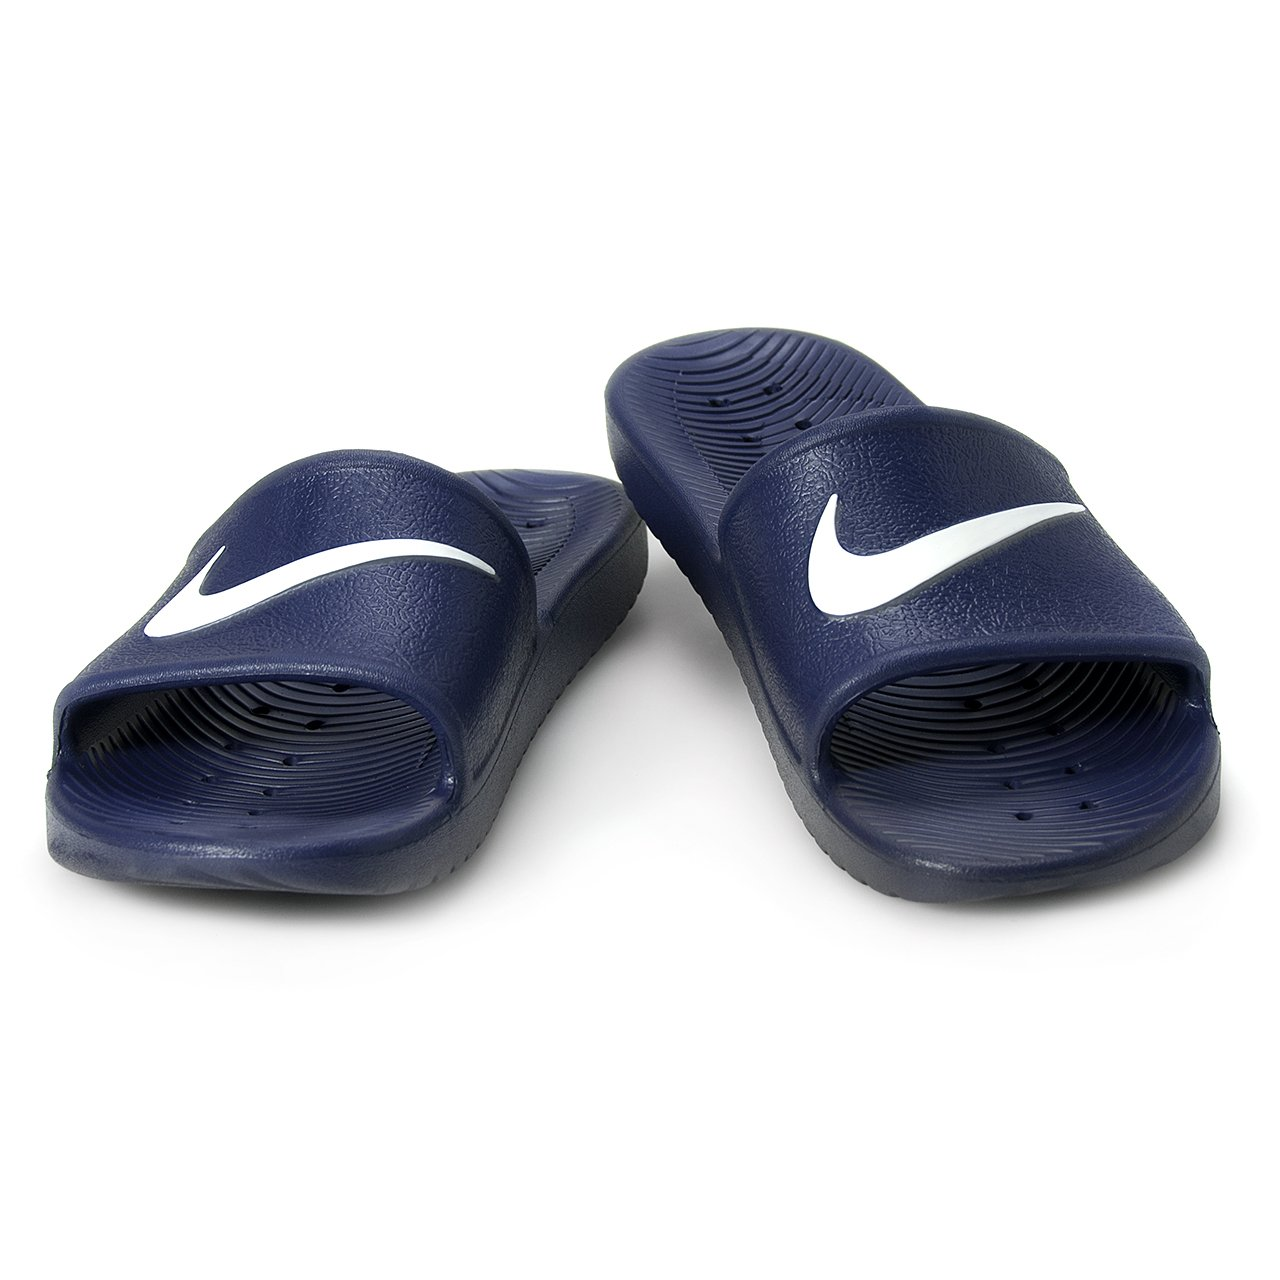 Nike Herren Kawa Shower Dusch- Badeschuhe  38 1/2 marine - wei?